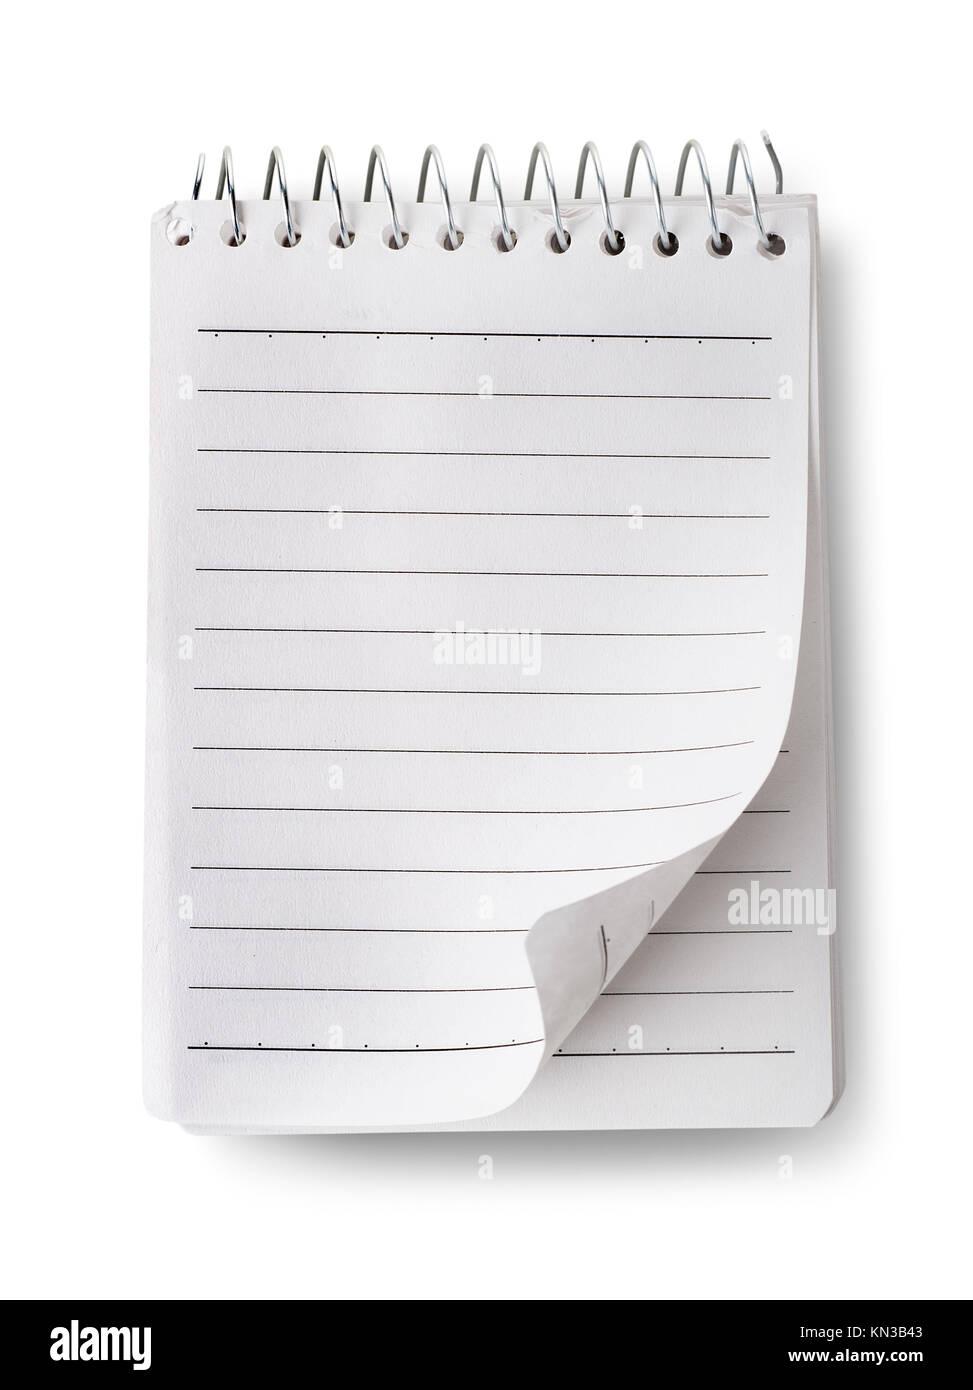 White notepad isolated on a white background. - Stock Image